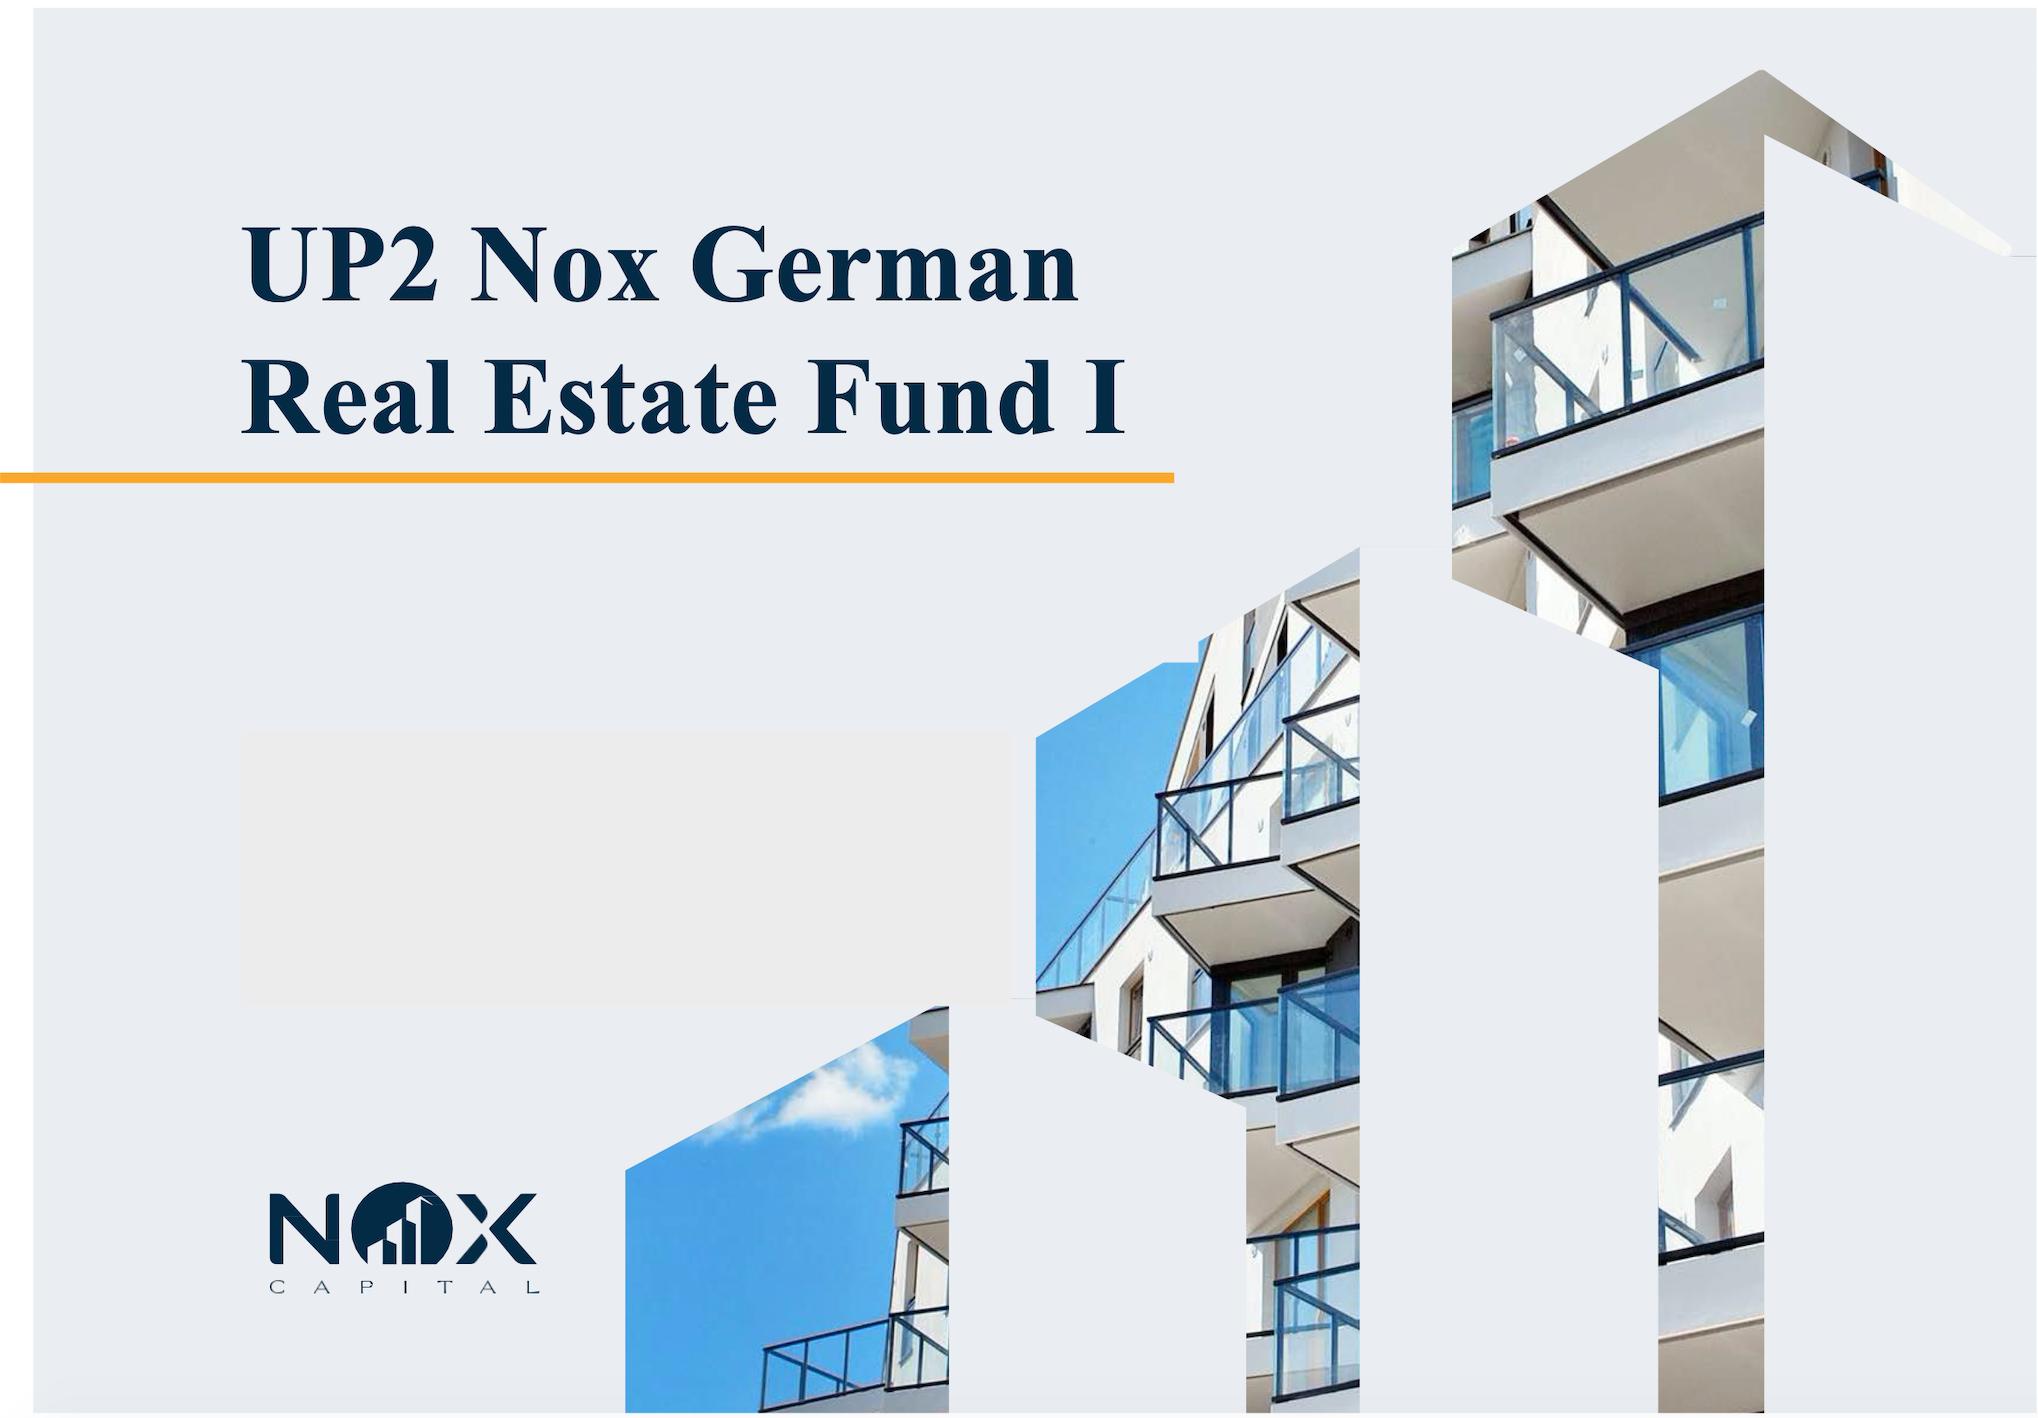 Up2 Nox German Real Estate Fund Immobilienfonds Wohnimmobilien